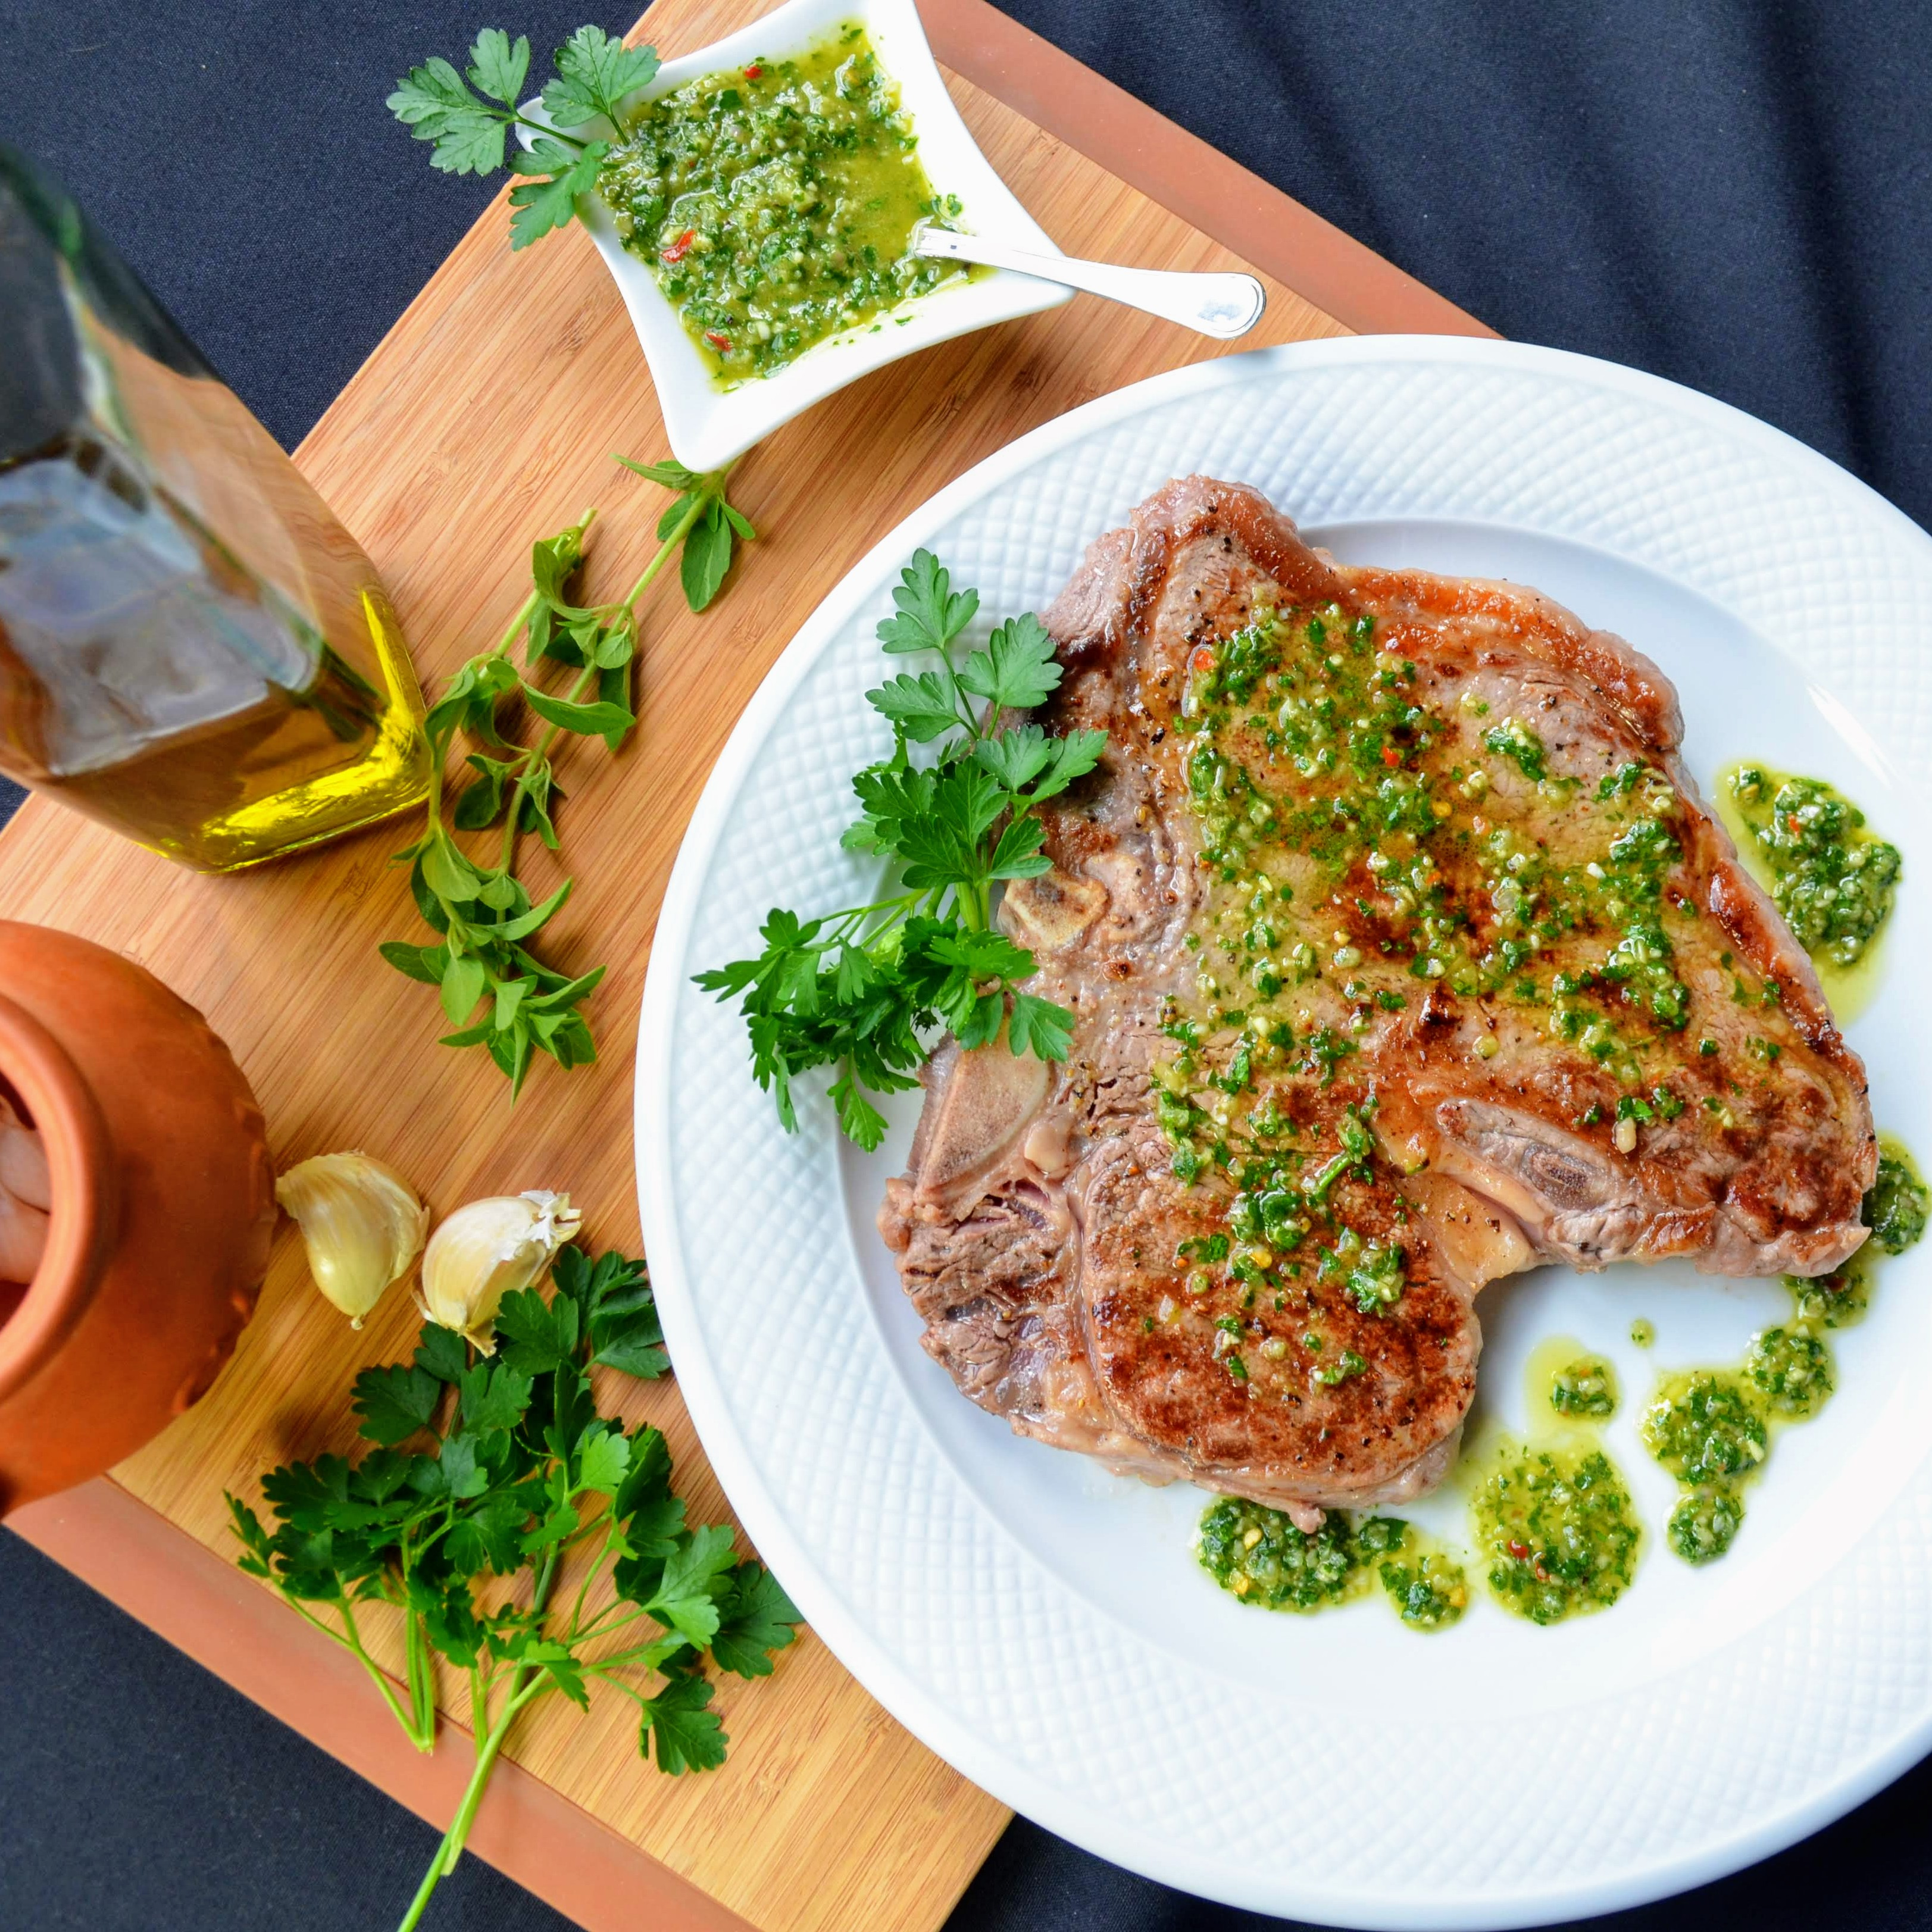 Grilled Porterhouse Steak with Chimichurri Sauce